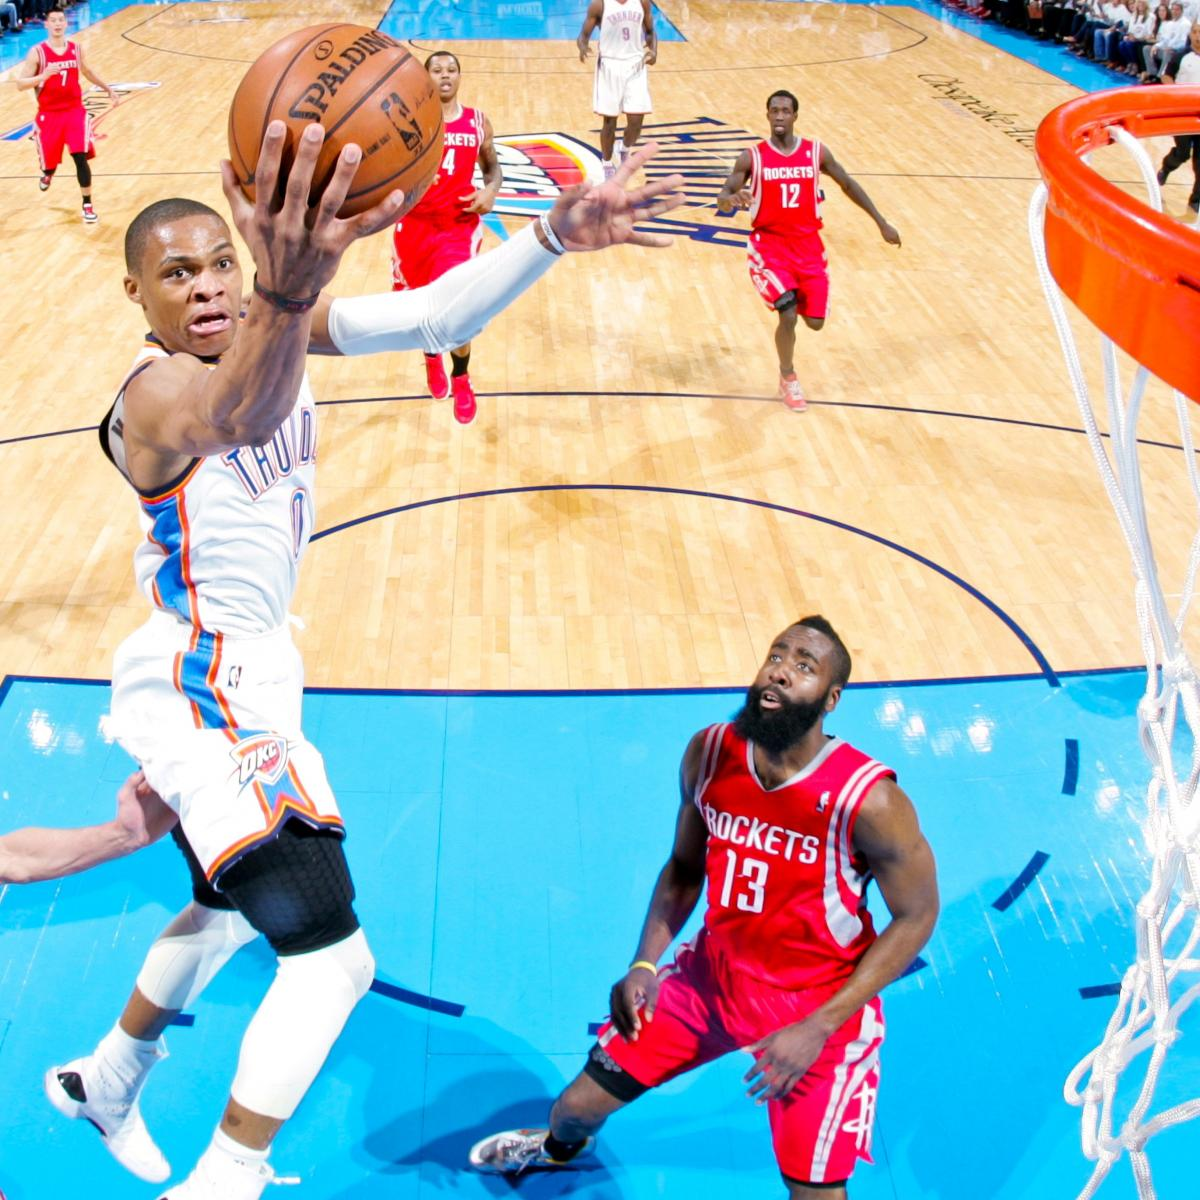 Houston Rockets Game Log: Houston Rockets Vs. OKC Thunder: Game 2 Score, Highlights